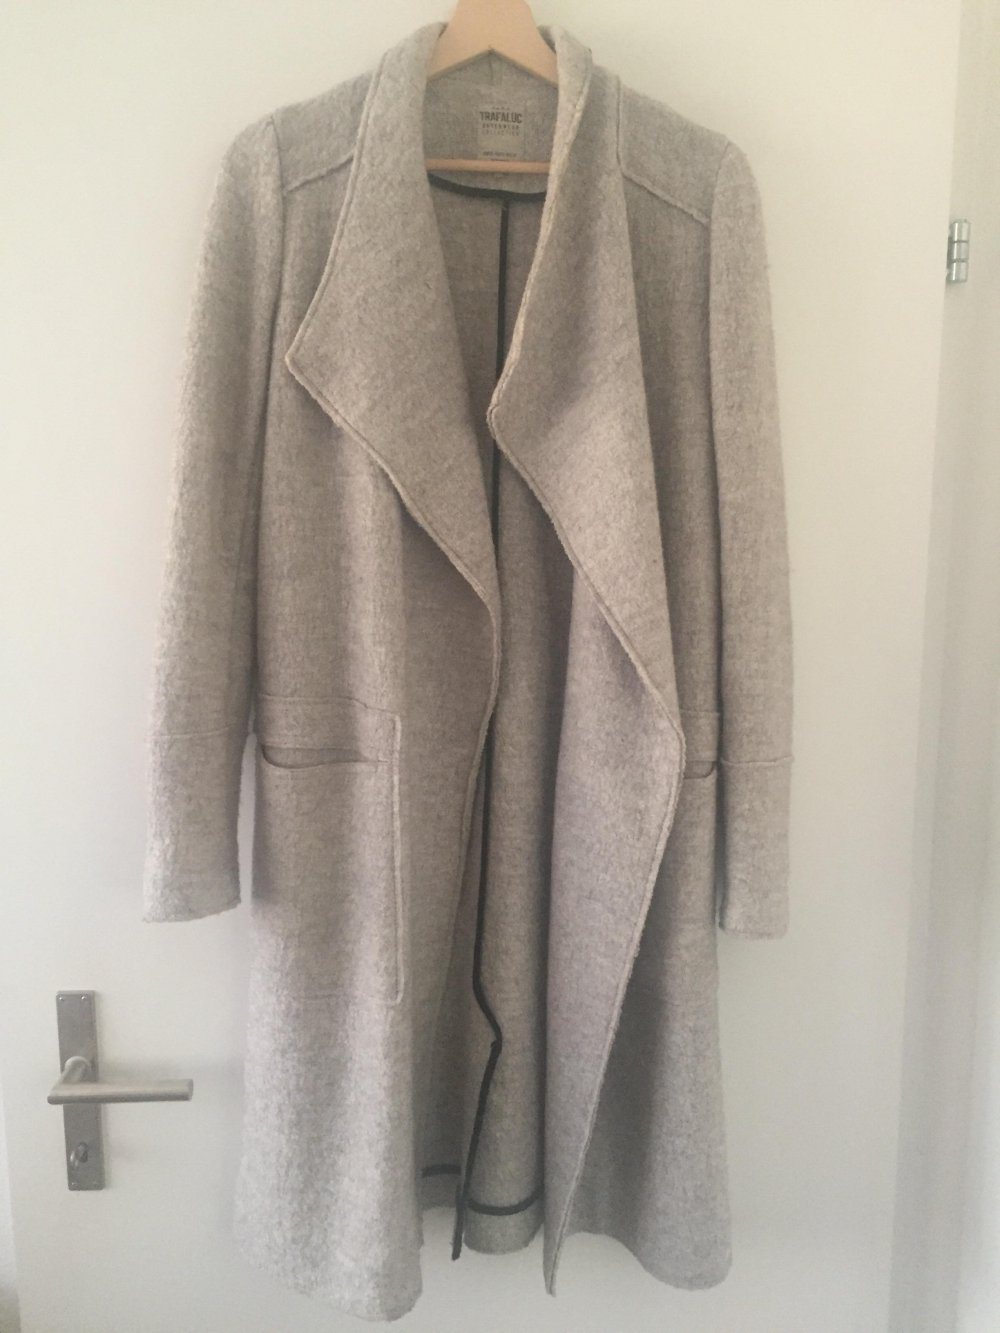 Grauer Mantel Wollmantel Zara